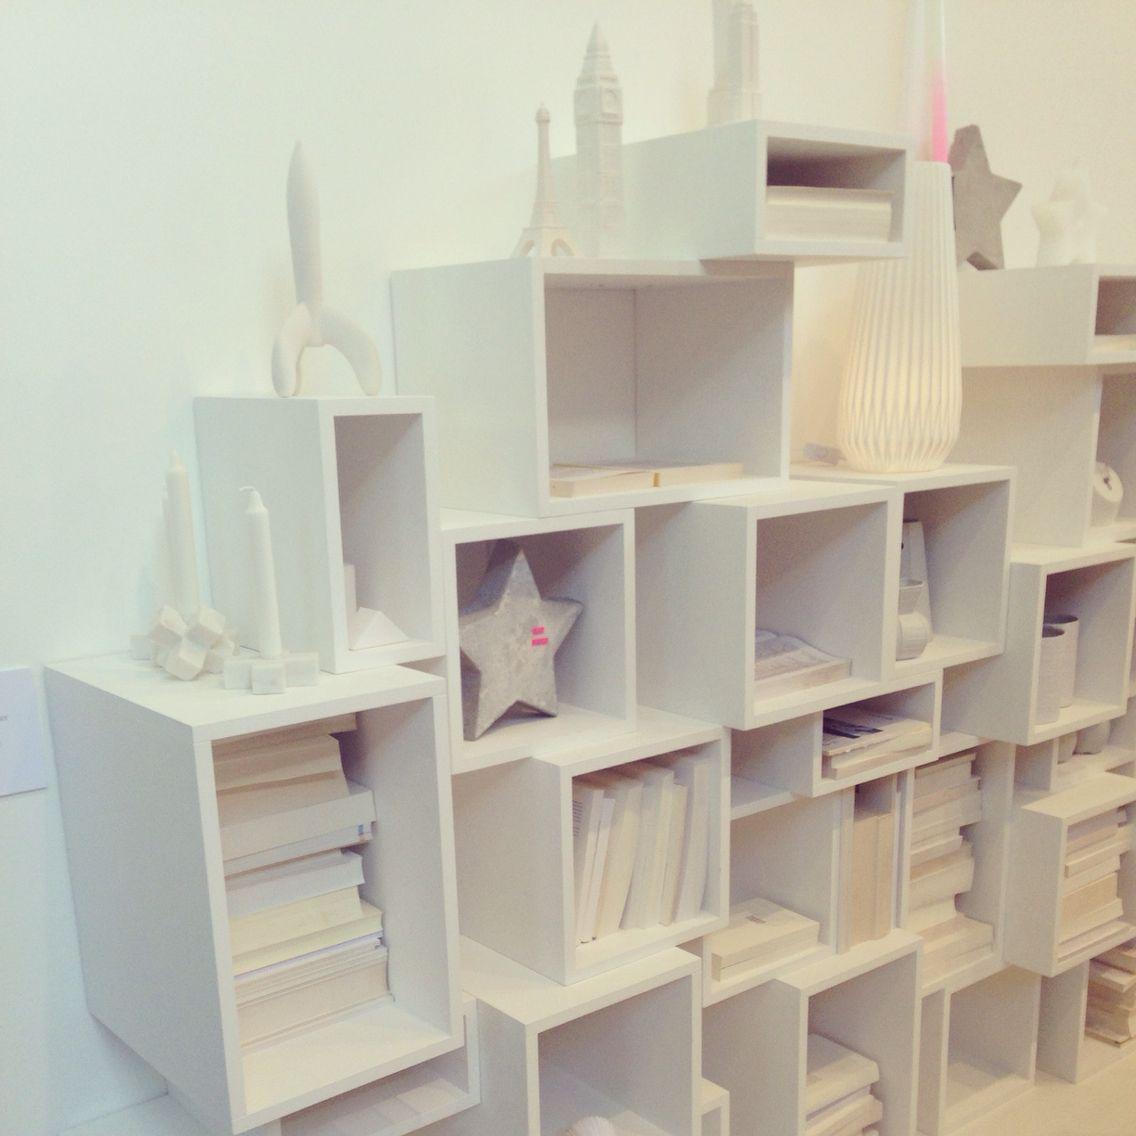 Witte open vakkenkast, Woonbeurs Amsterdam 2014